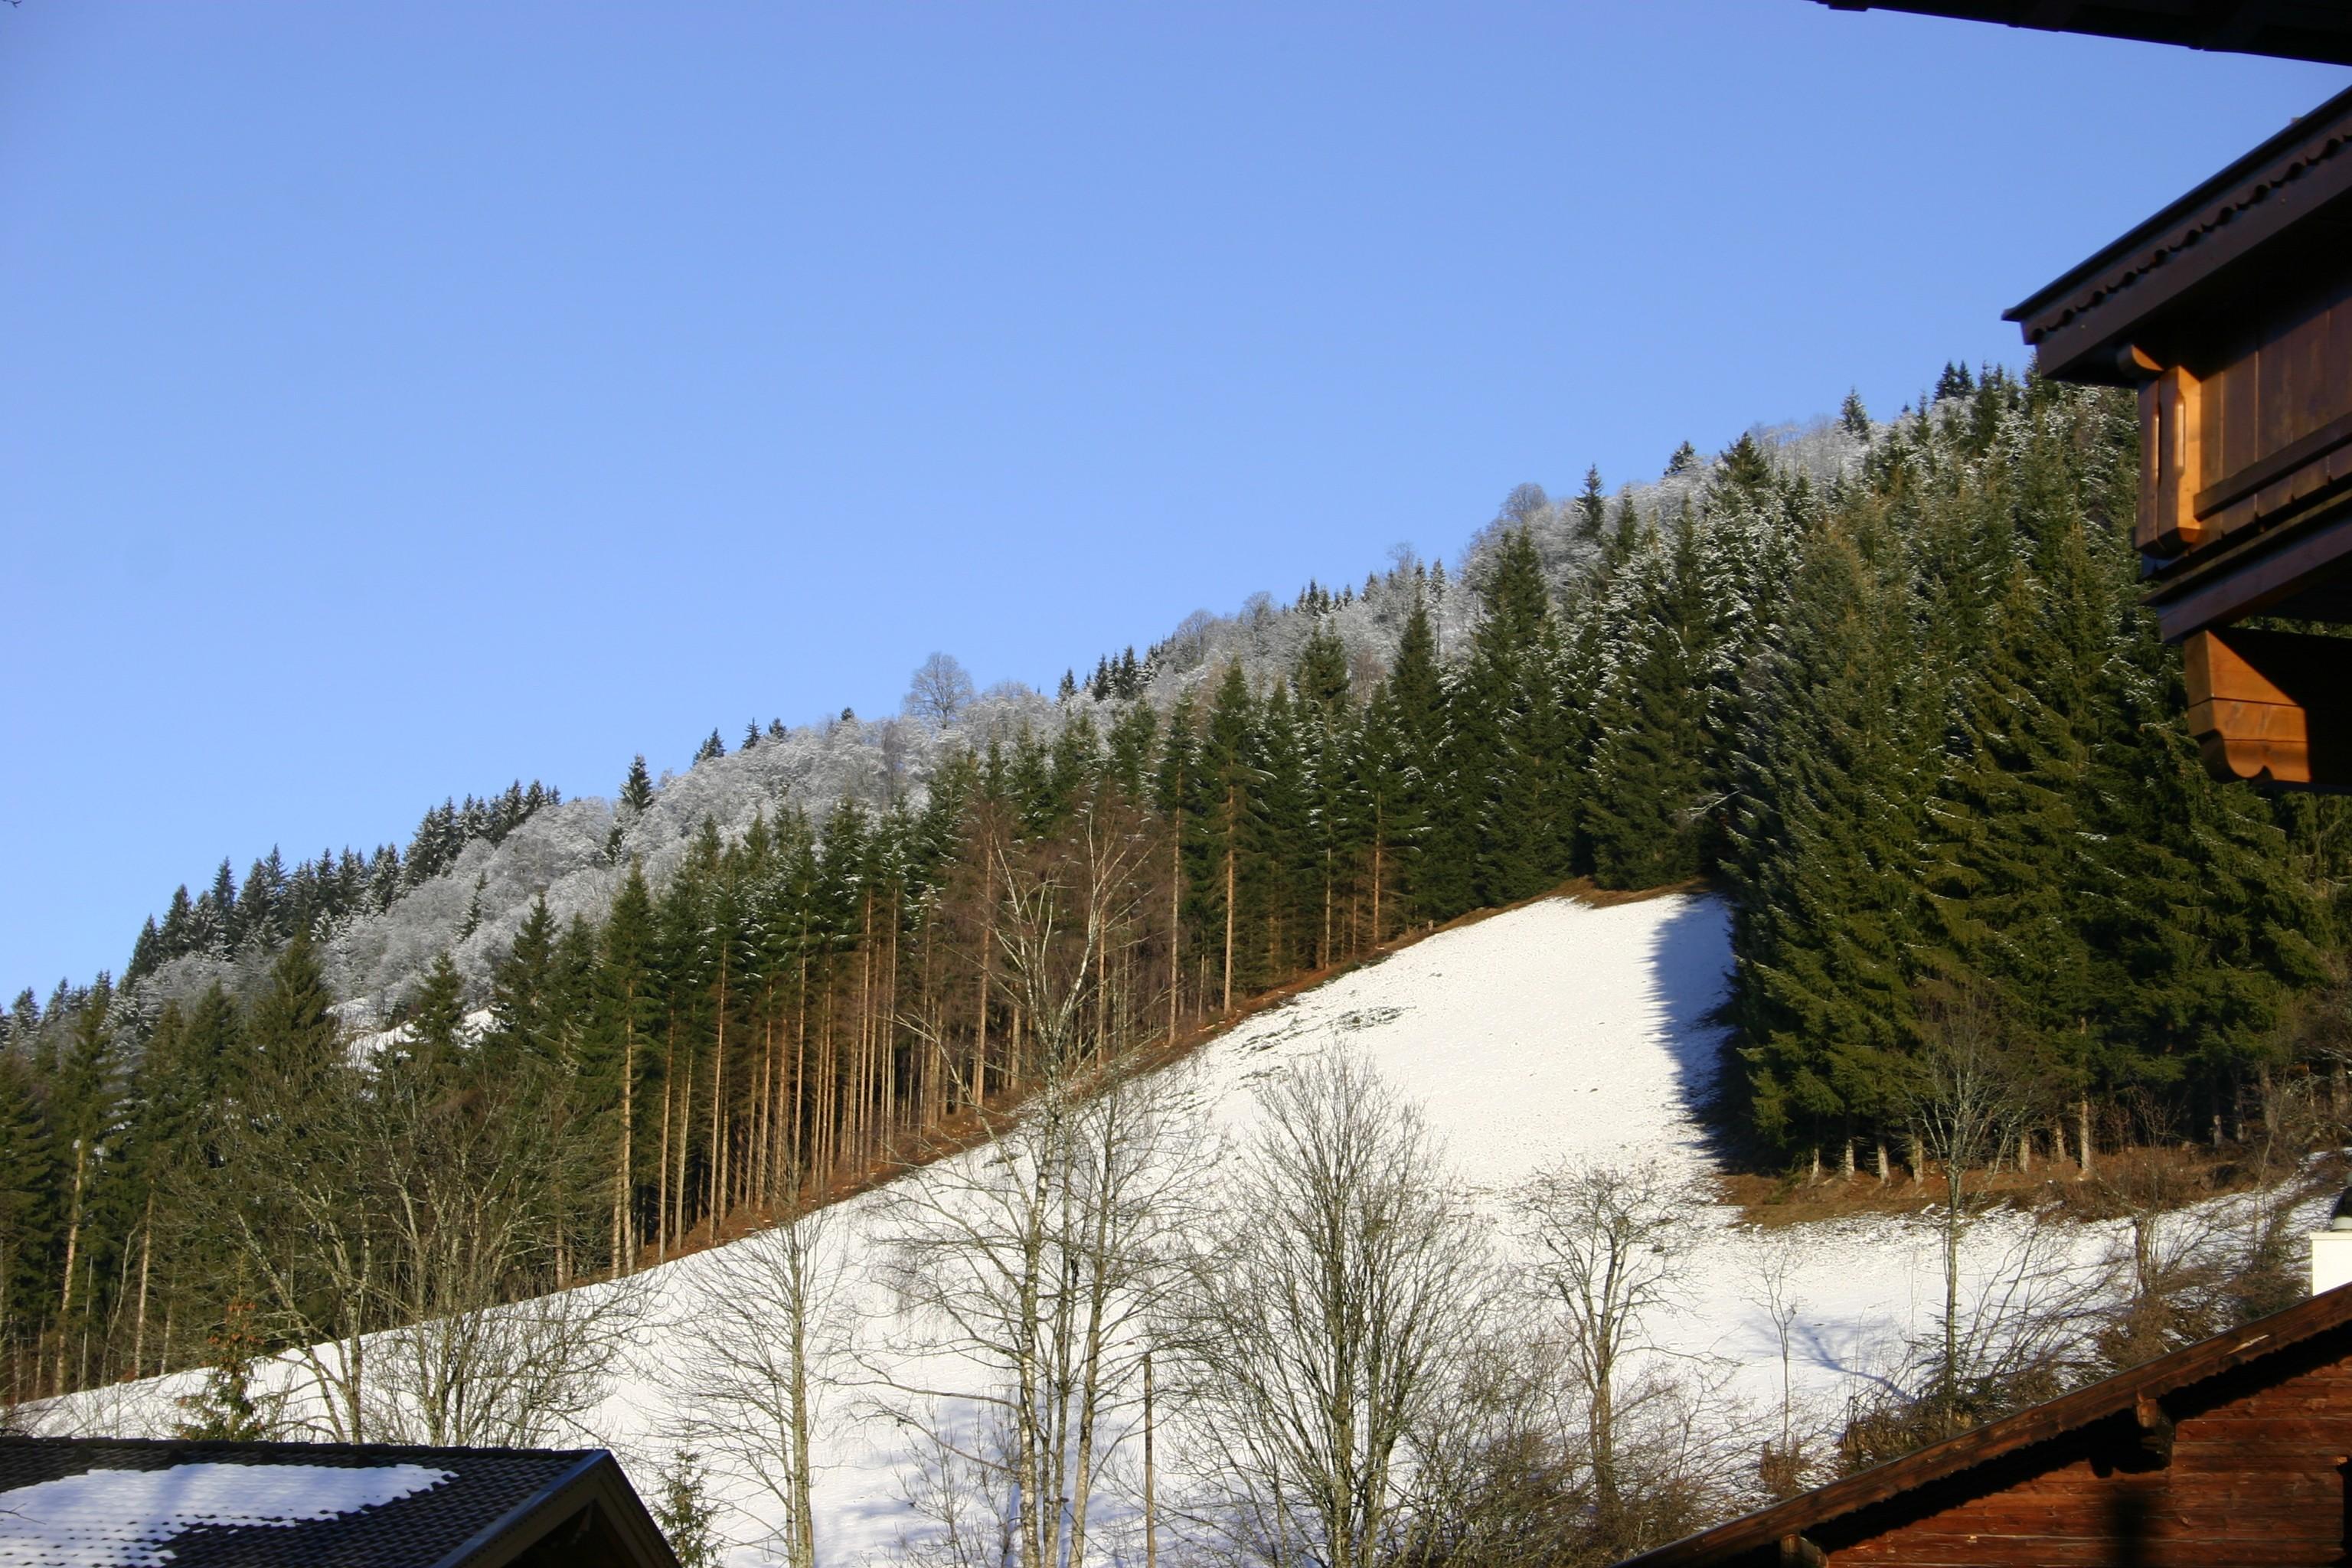 Skicircus Saalbach Hinterglemm Leogang 172 - Dag 4